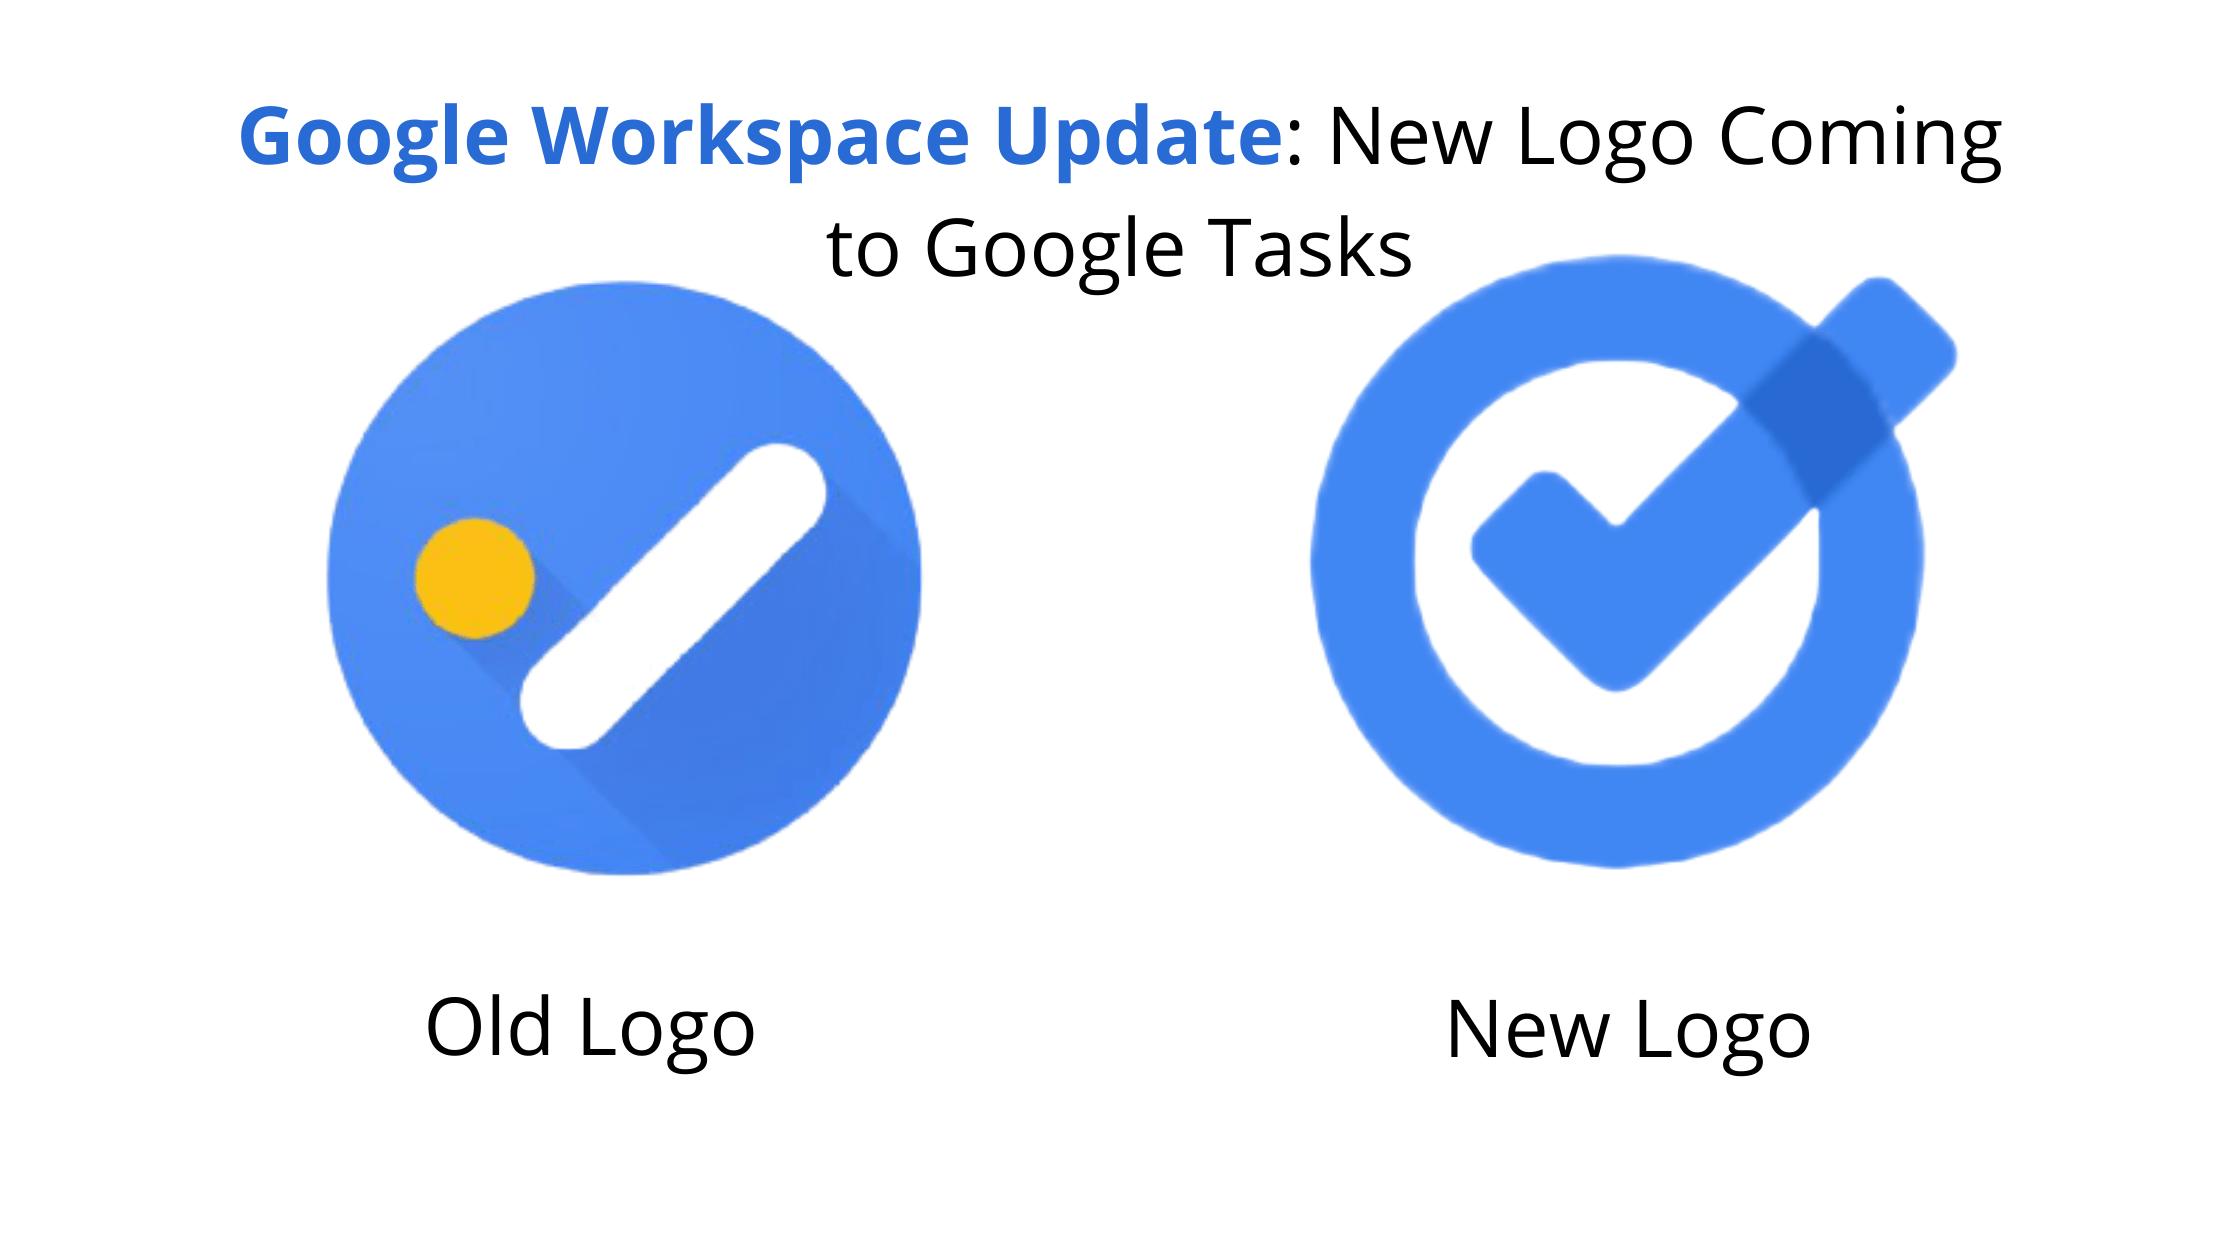 Google Workspace Update: New Logo Coming to Google Tasks